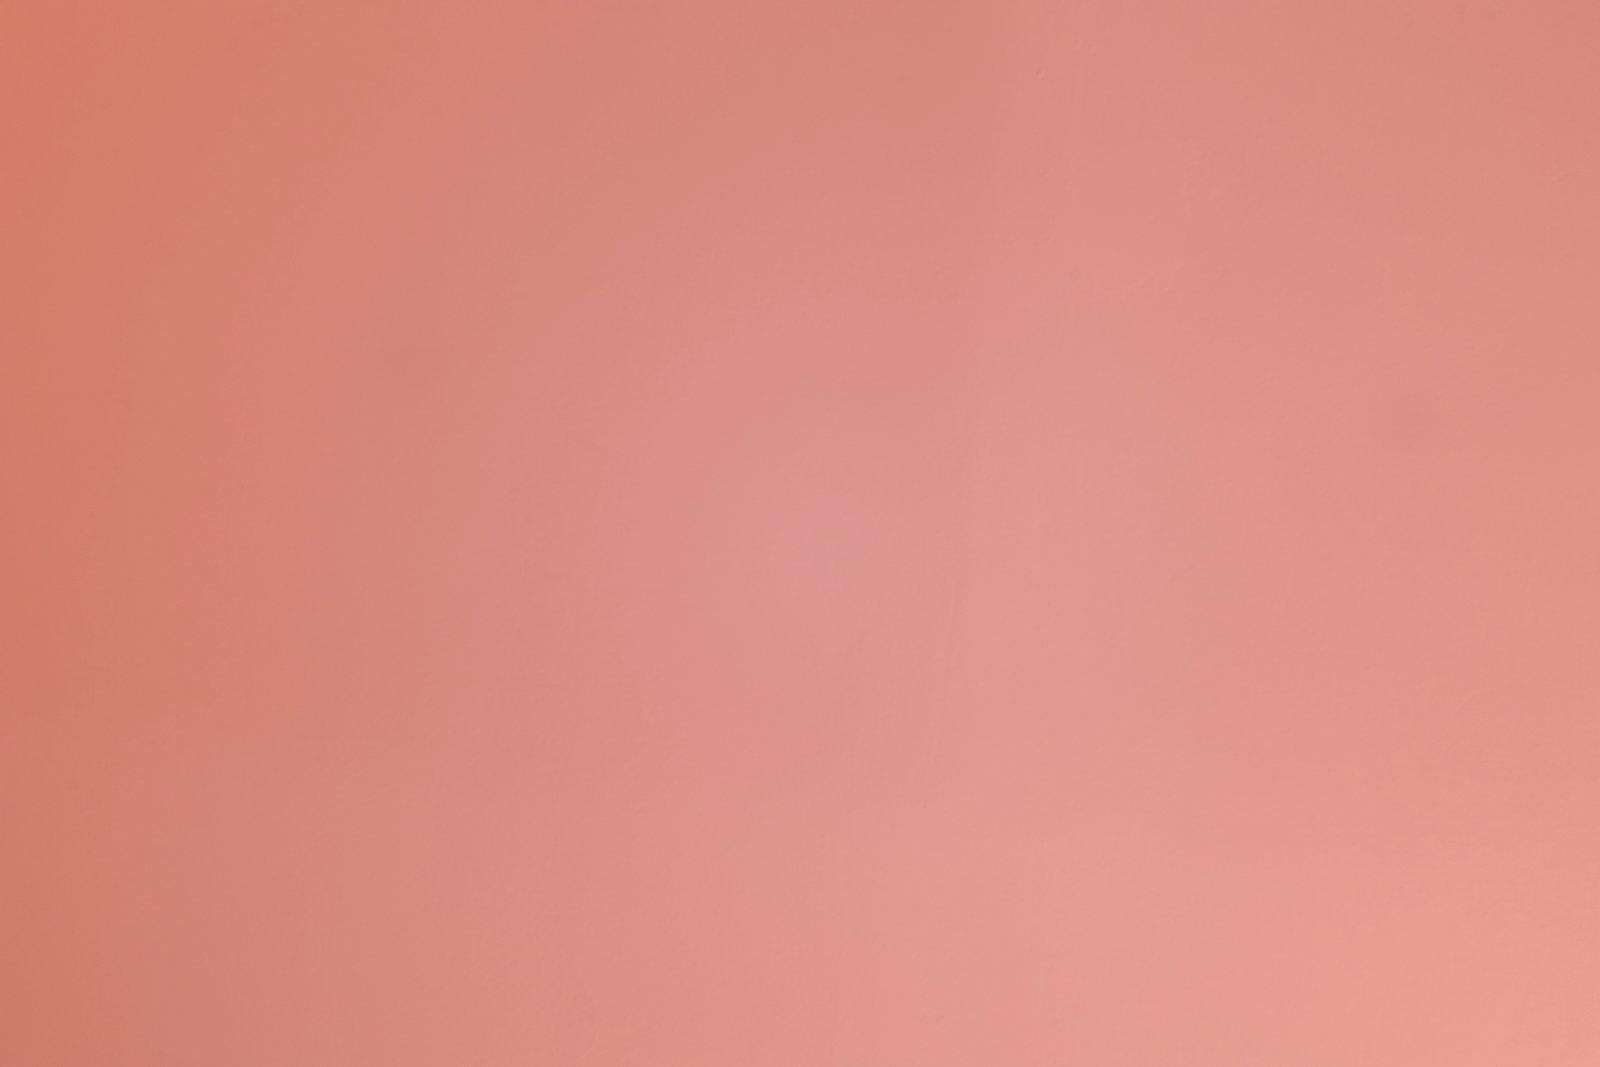 test infrarouge HOTSPOT 24mm F11 CANON | Pierre-Louis Ferrer | Test du SIGMA 24mm F/1.4 DG HSM Art en photographie infrarouge | Partie 1